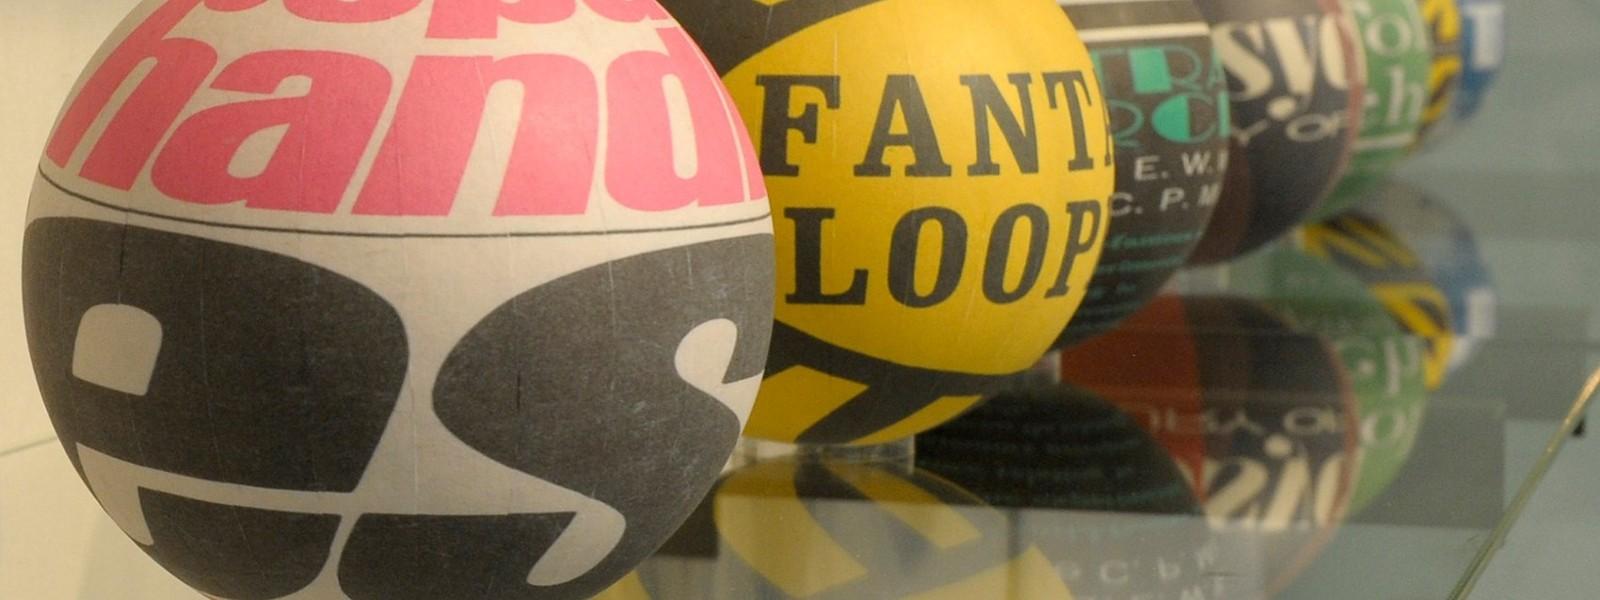 Book Spheres, 2013-14, F.E. McWilliam Gallery. Photo: Eddie Byrne - Detail